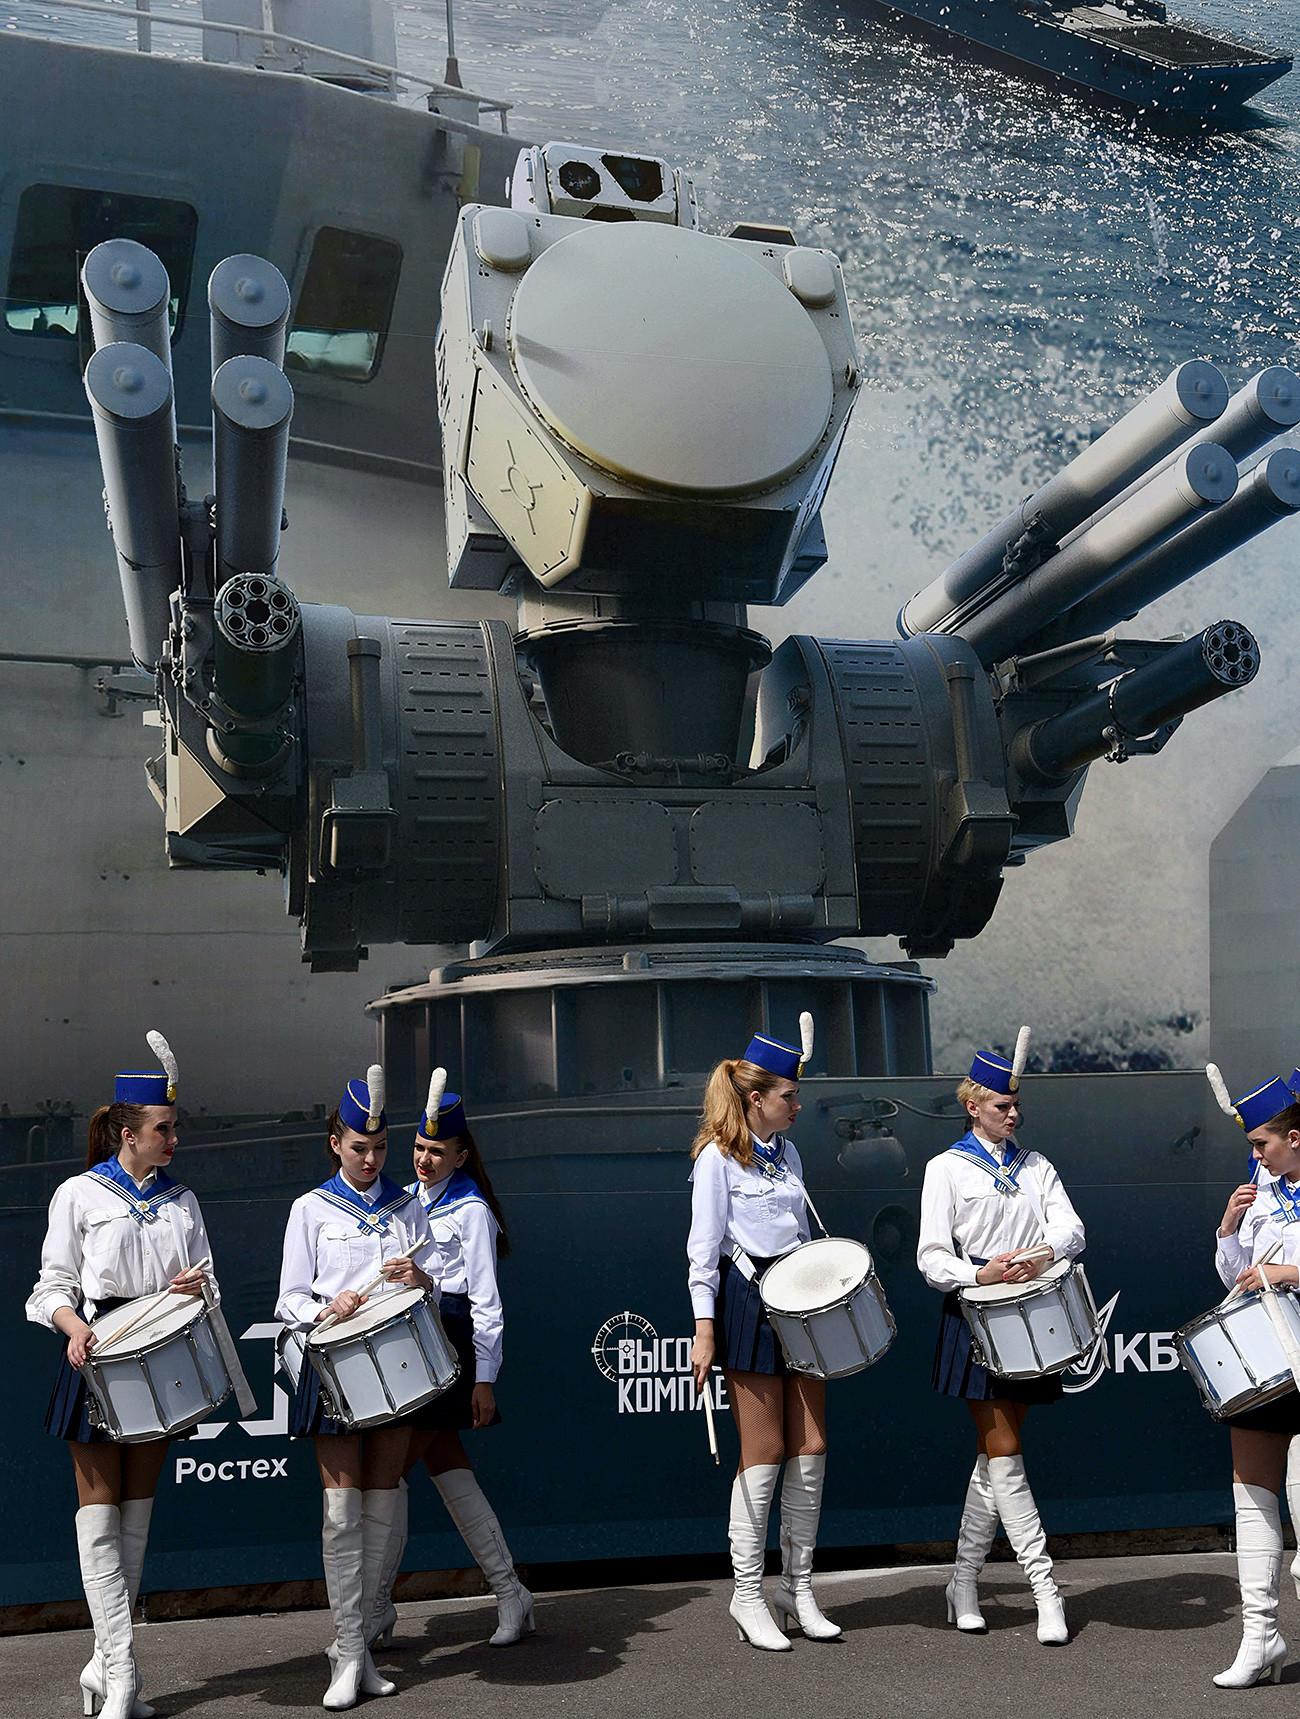 """Панцирь-МЕ"", отворање на 8 меѓународен поморски салон во Санкт Петербург, 28 јуни 2017."